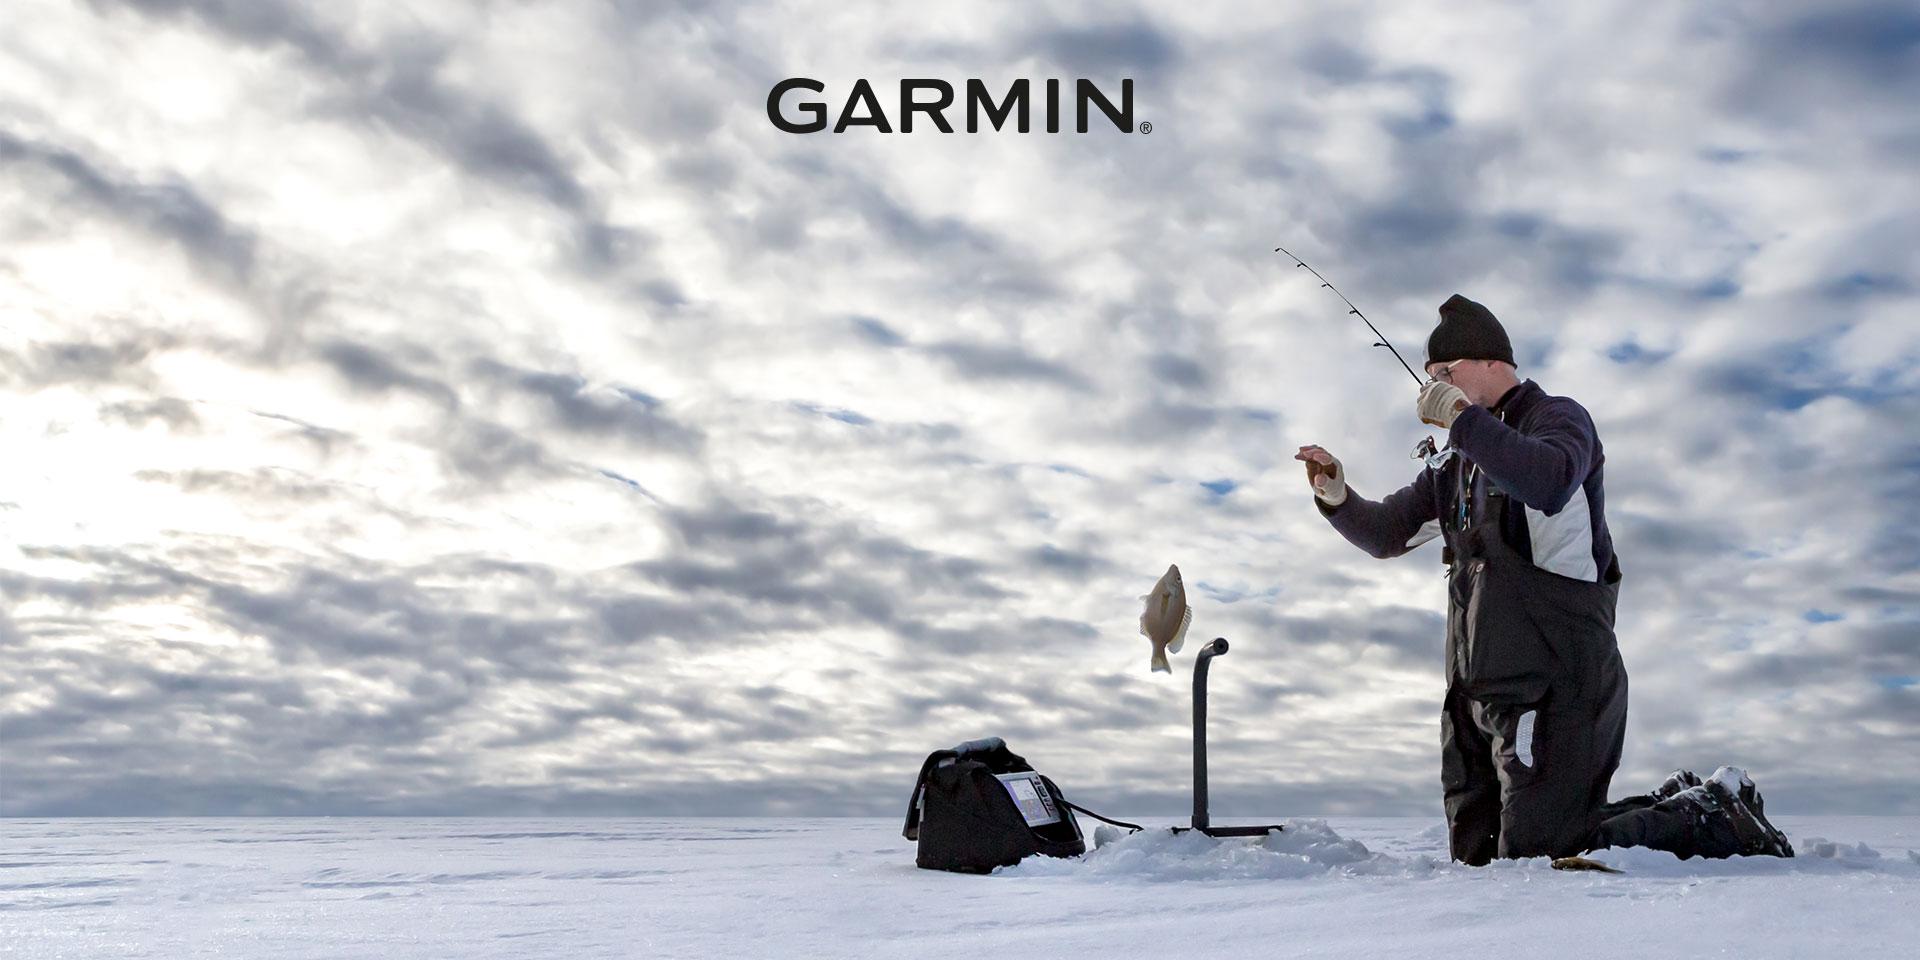 https://www.olssonsfiske.se/pub_docs/files/Custom_Item_Images/garmin-isfiske-hero.jpg